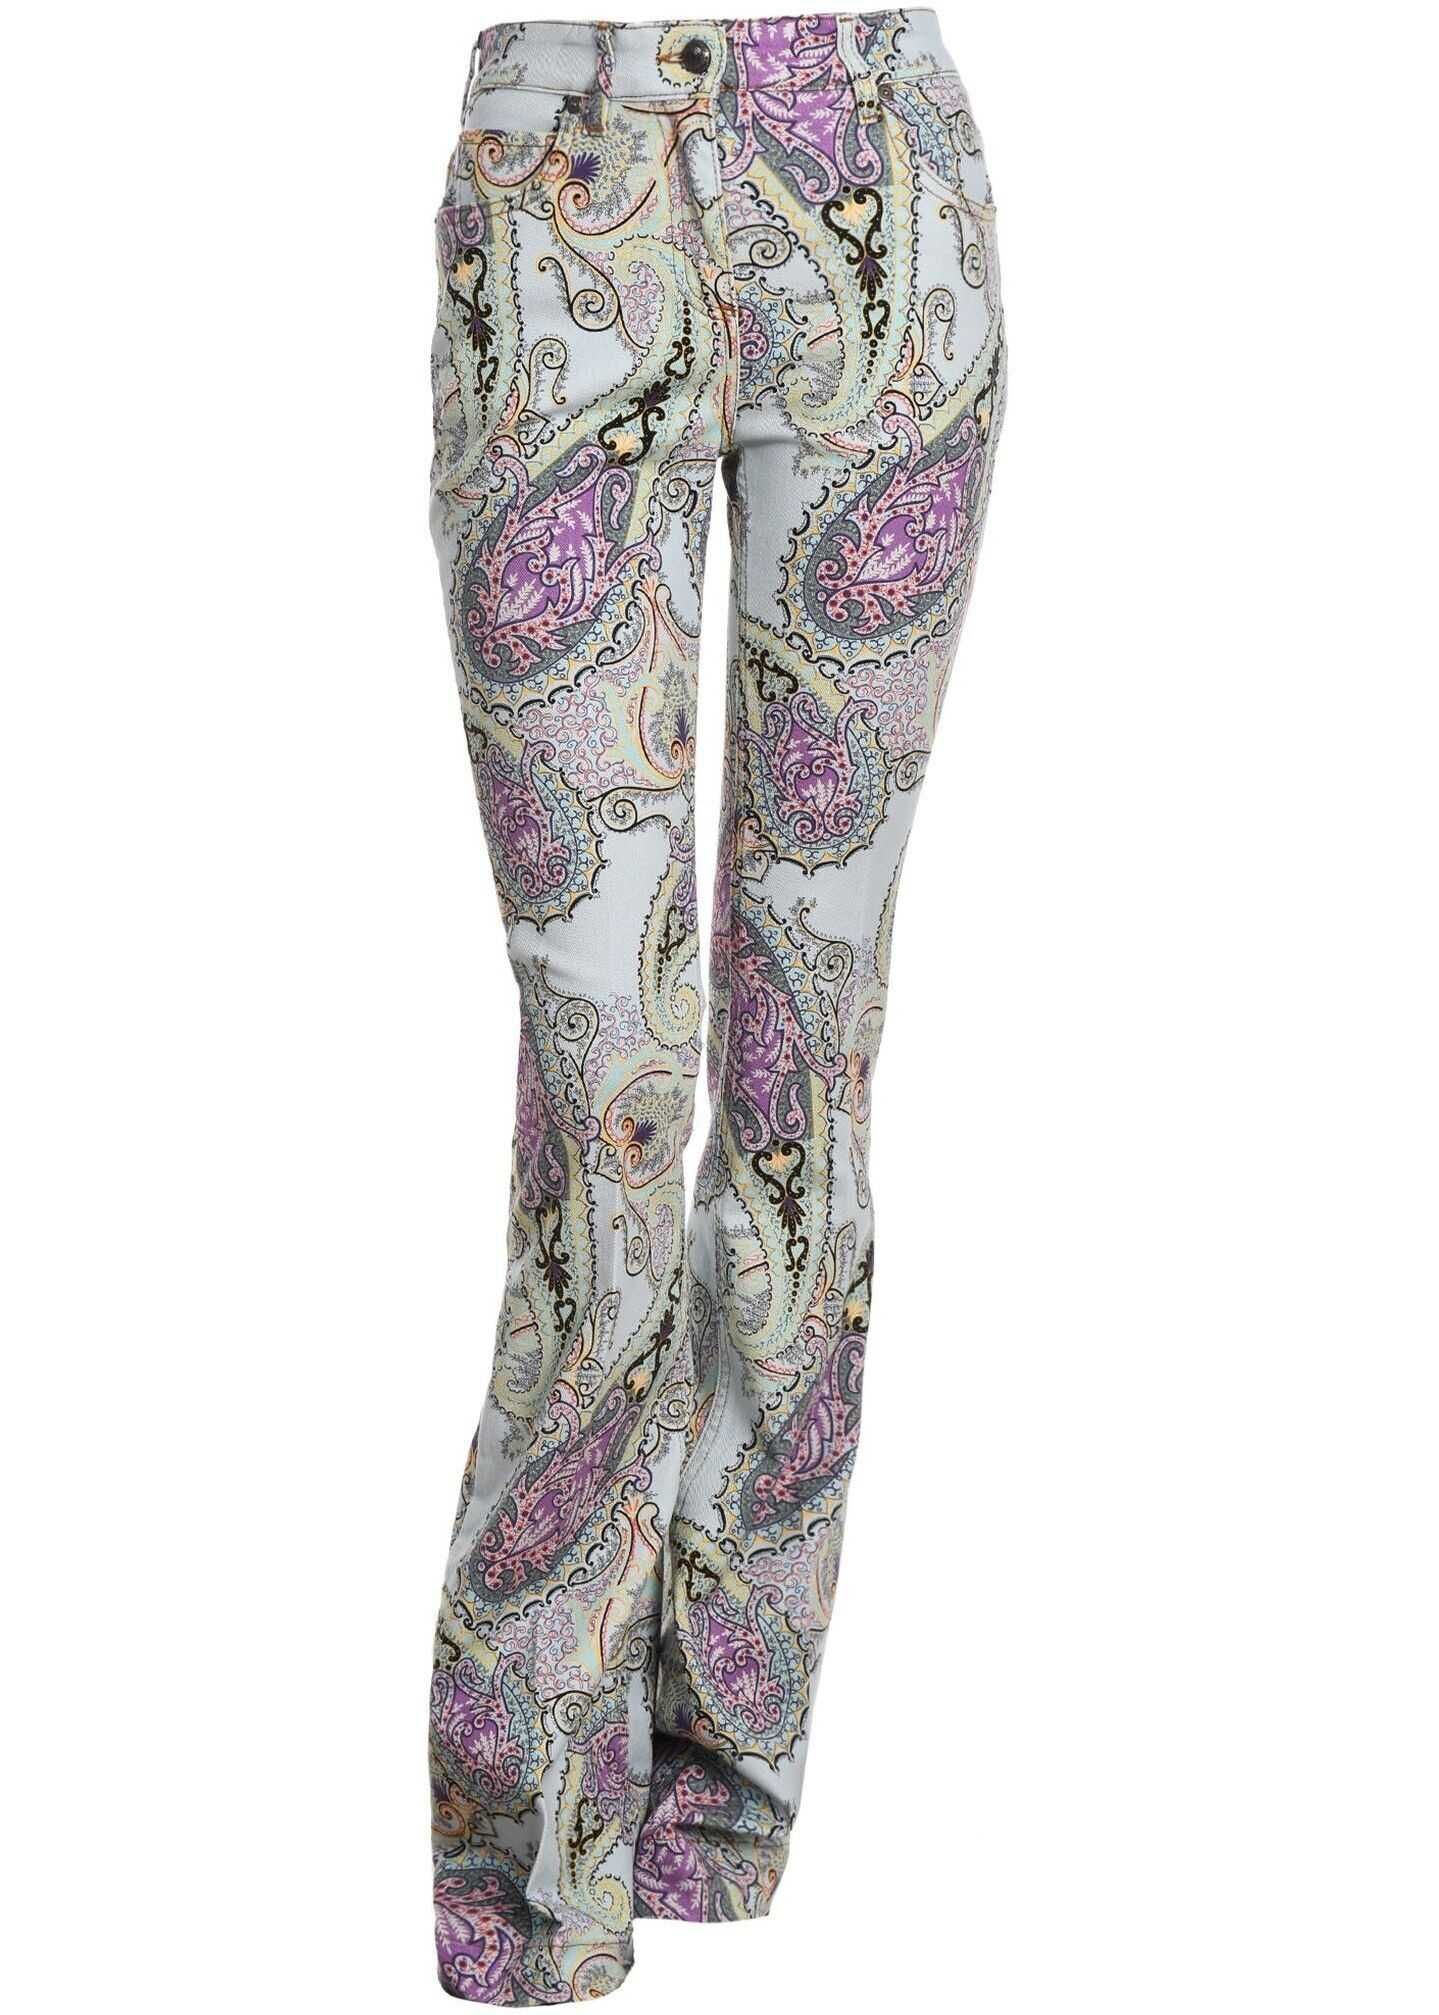 ETRO Cotton Jeans MULTICOLOR